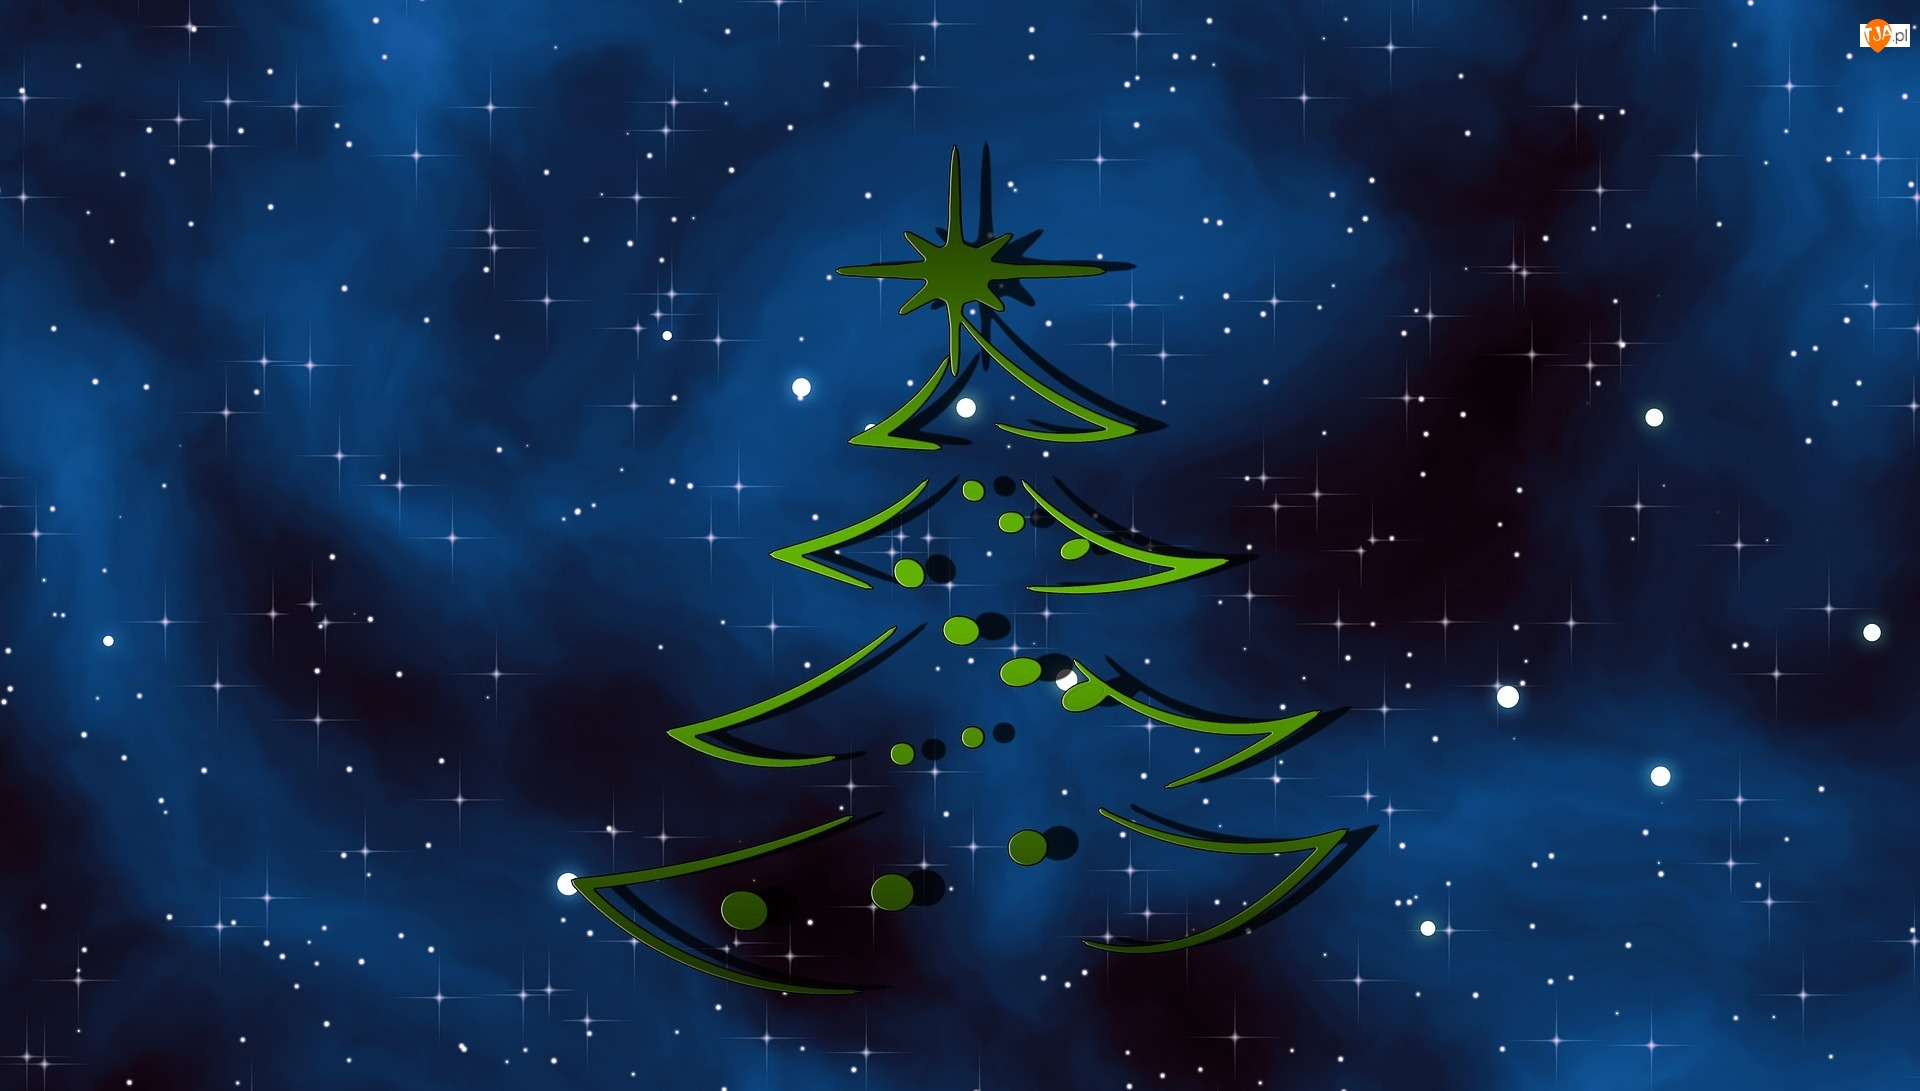 Grafika 2D, Niebo, Choinka, Gwiazdy